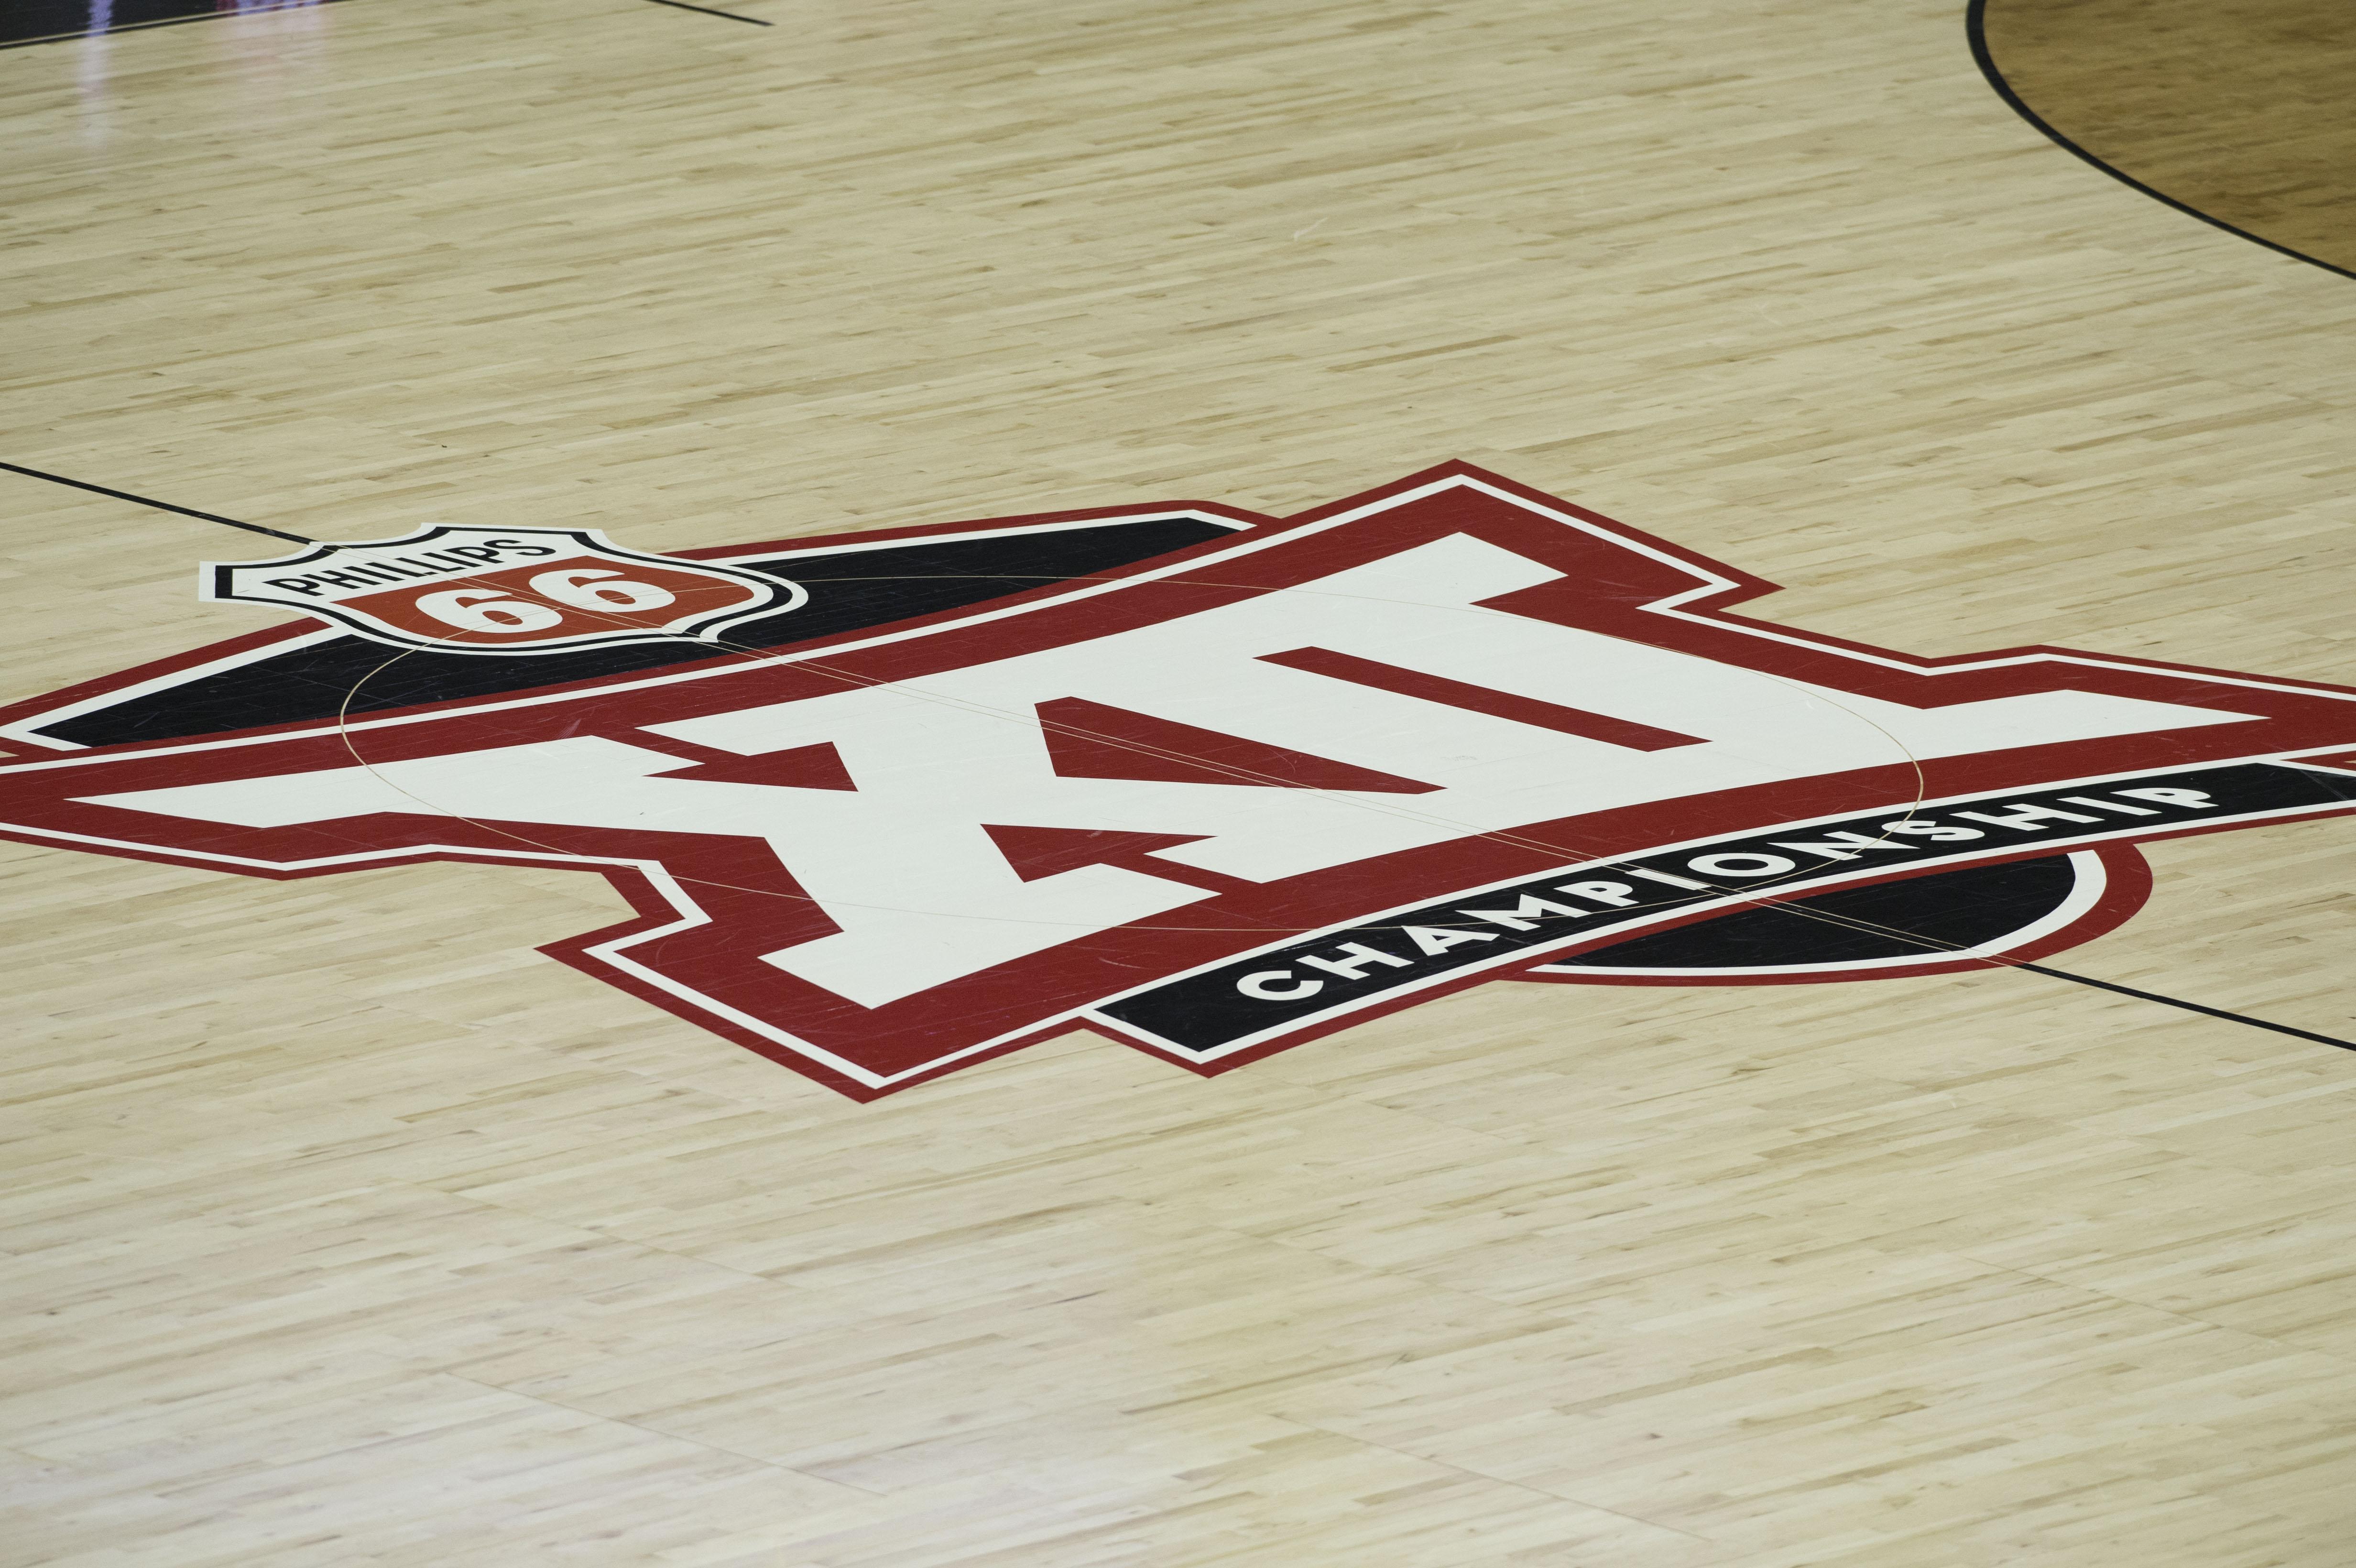 9934140-ncaa-basketball-big-12-championship-iowa-state-vs-west-virginia